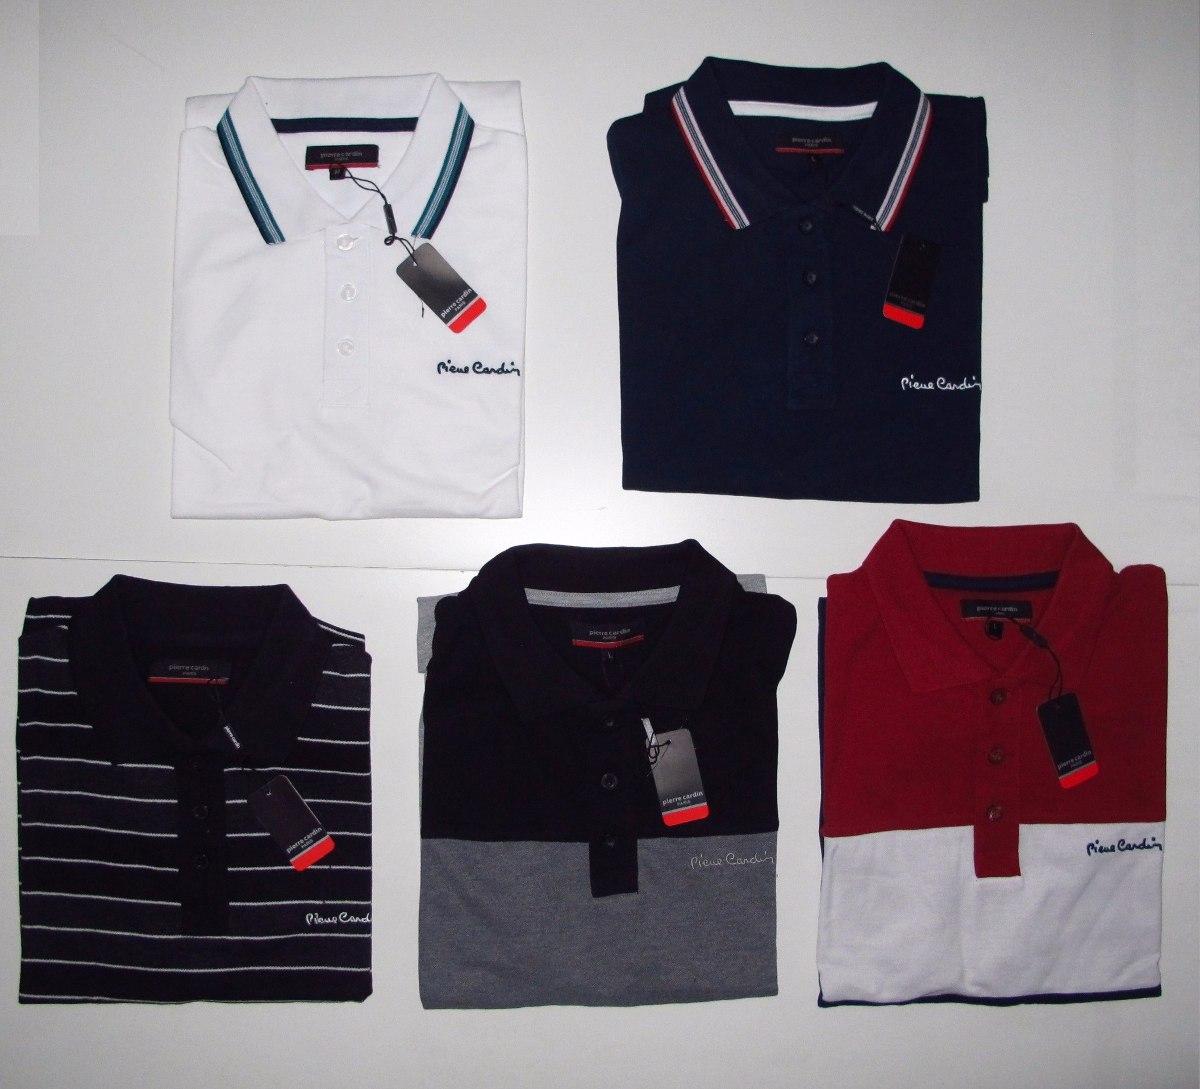 a73225433e579 3 camisas polo pierre cardin plus size luxo produto original. Carregando  zoom.